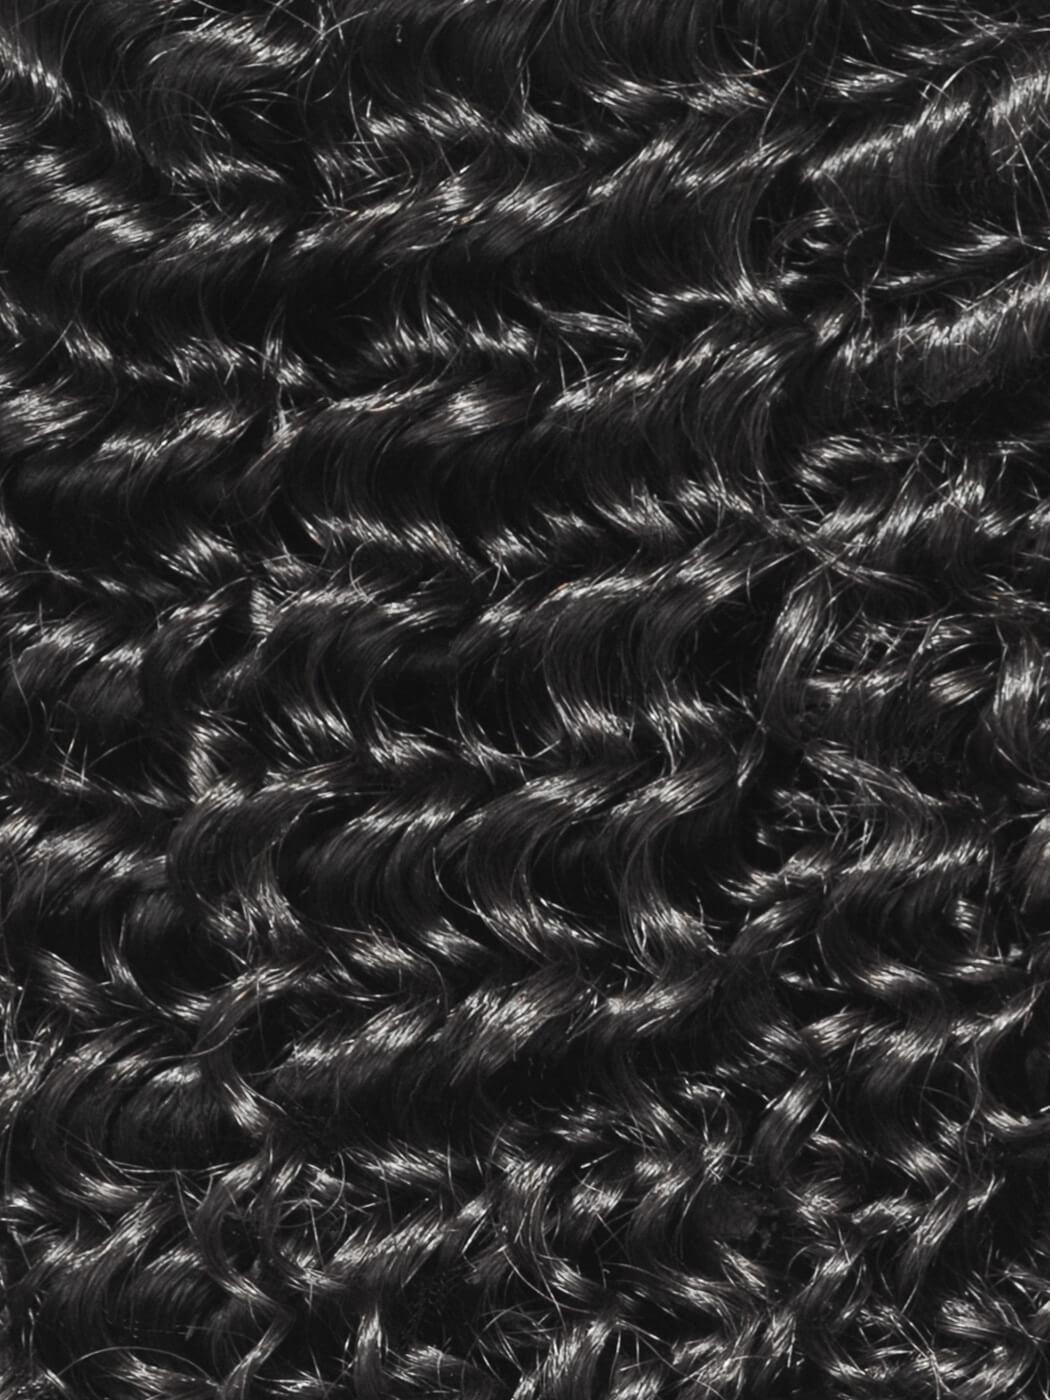 Human Hair | Jet Black